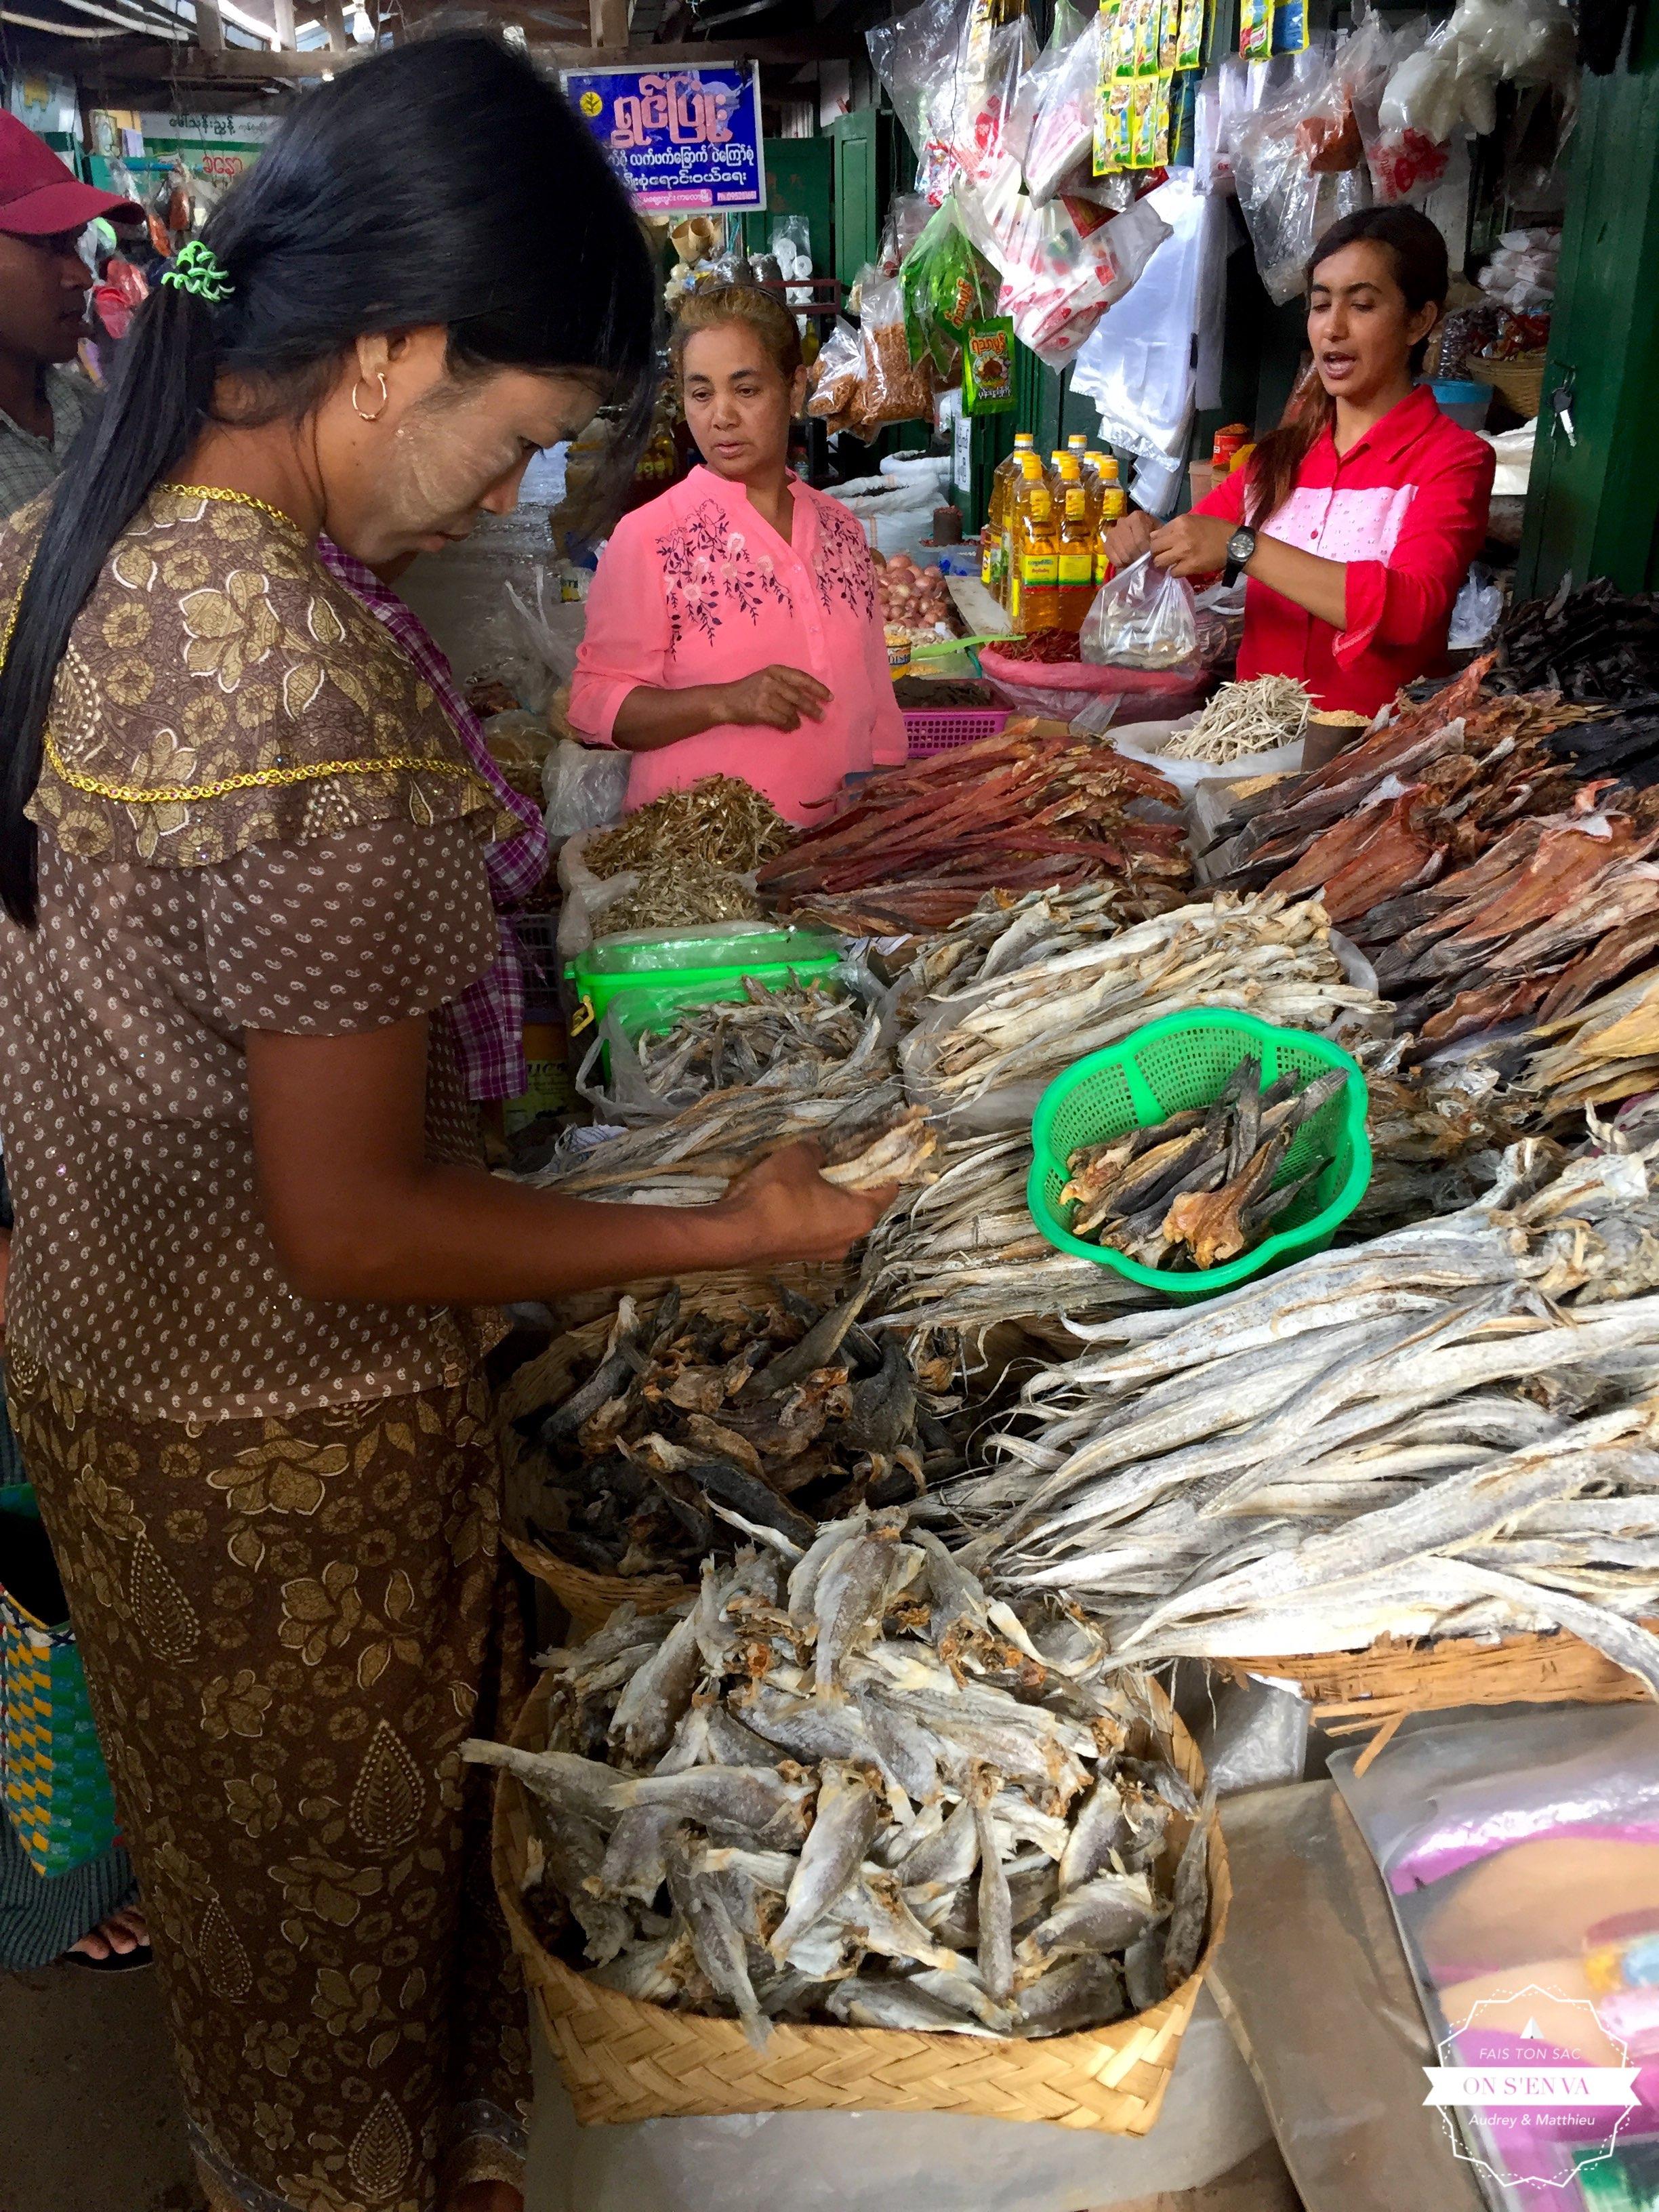 Marché de Kalaw, rayon poisson séché